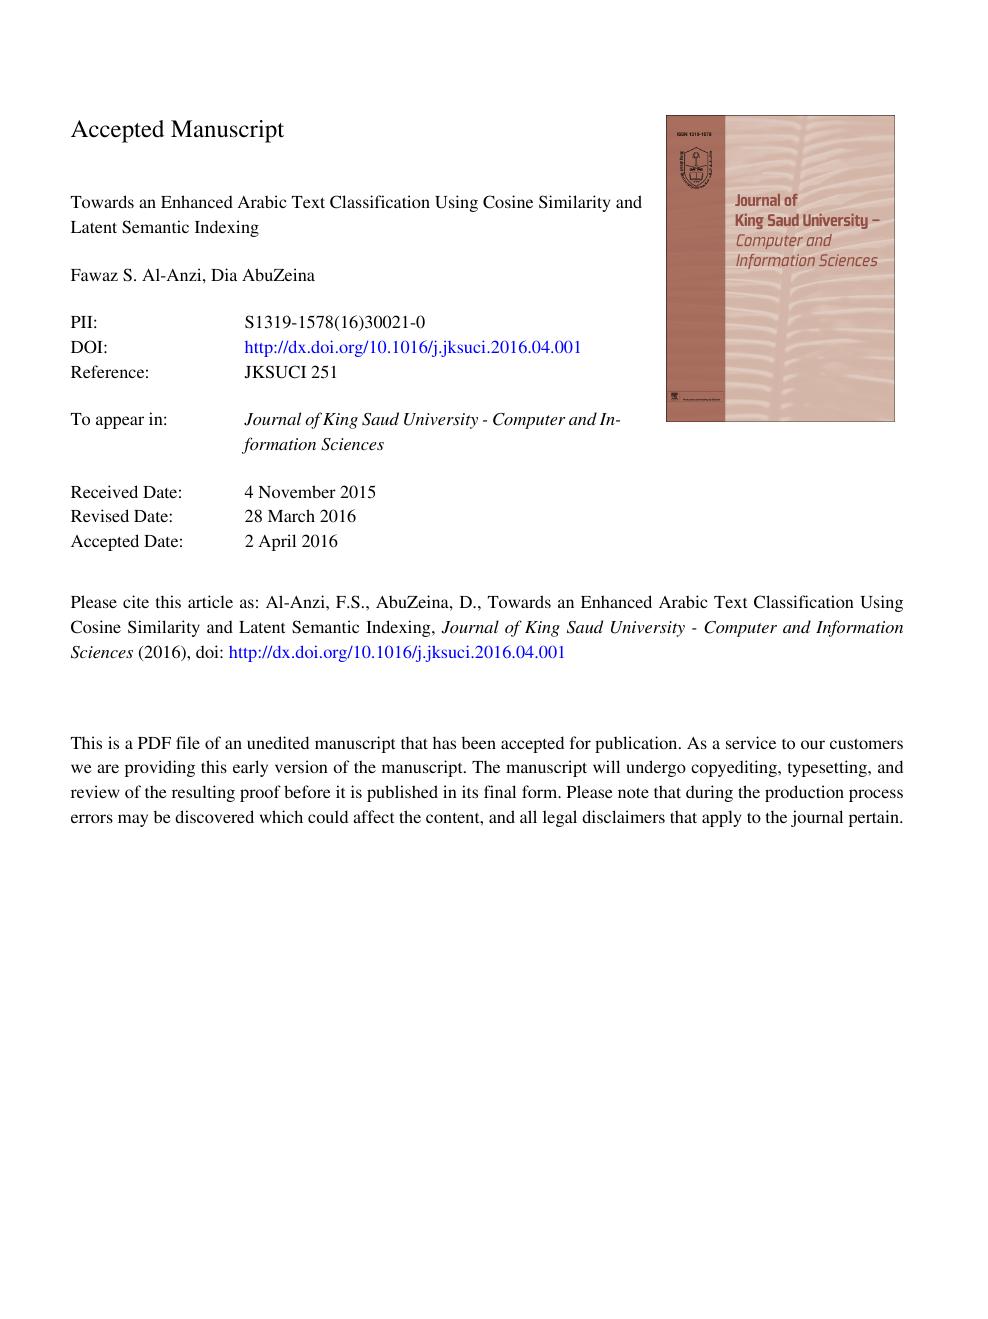 Toward an enhanced Arabic text classification using cosine